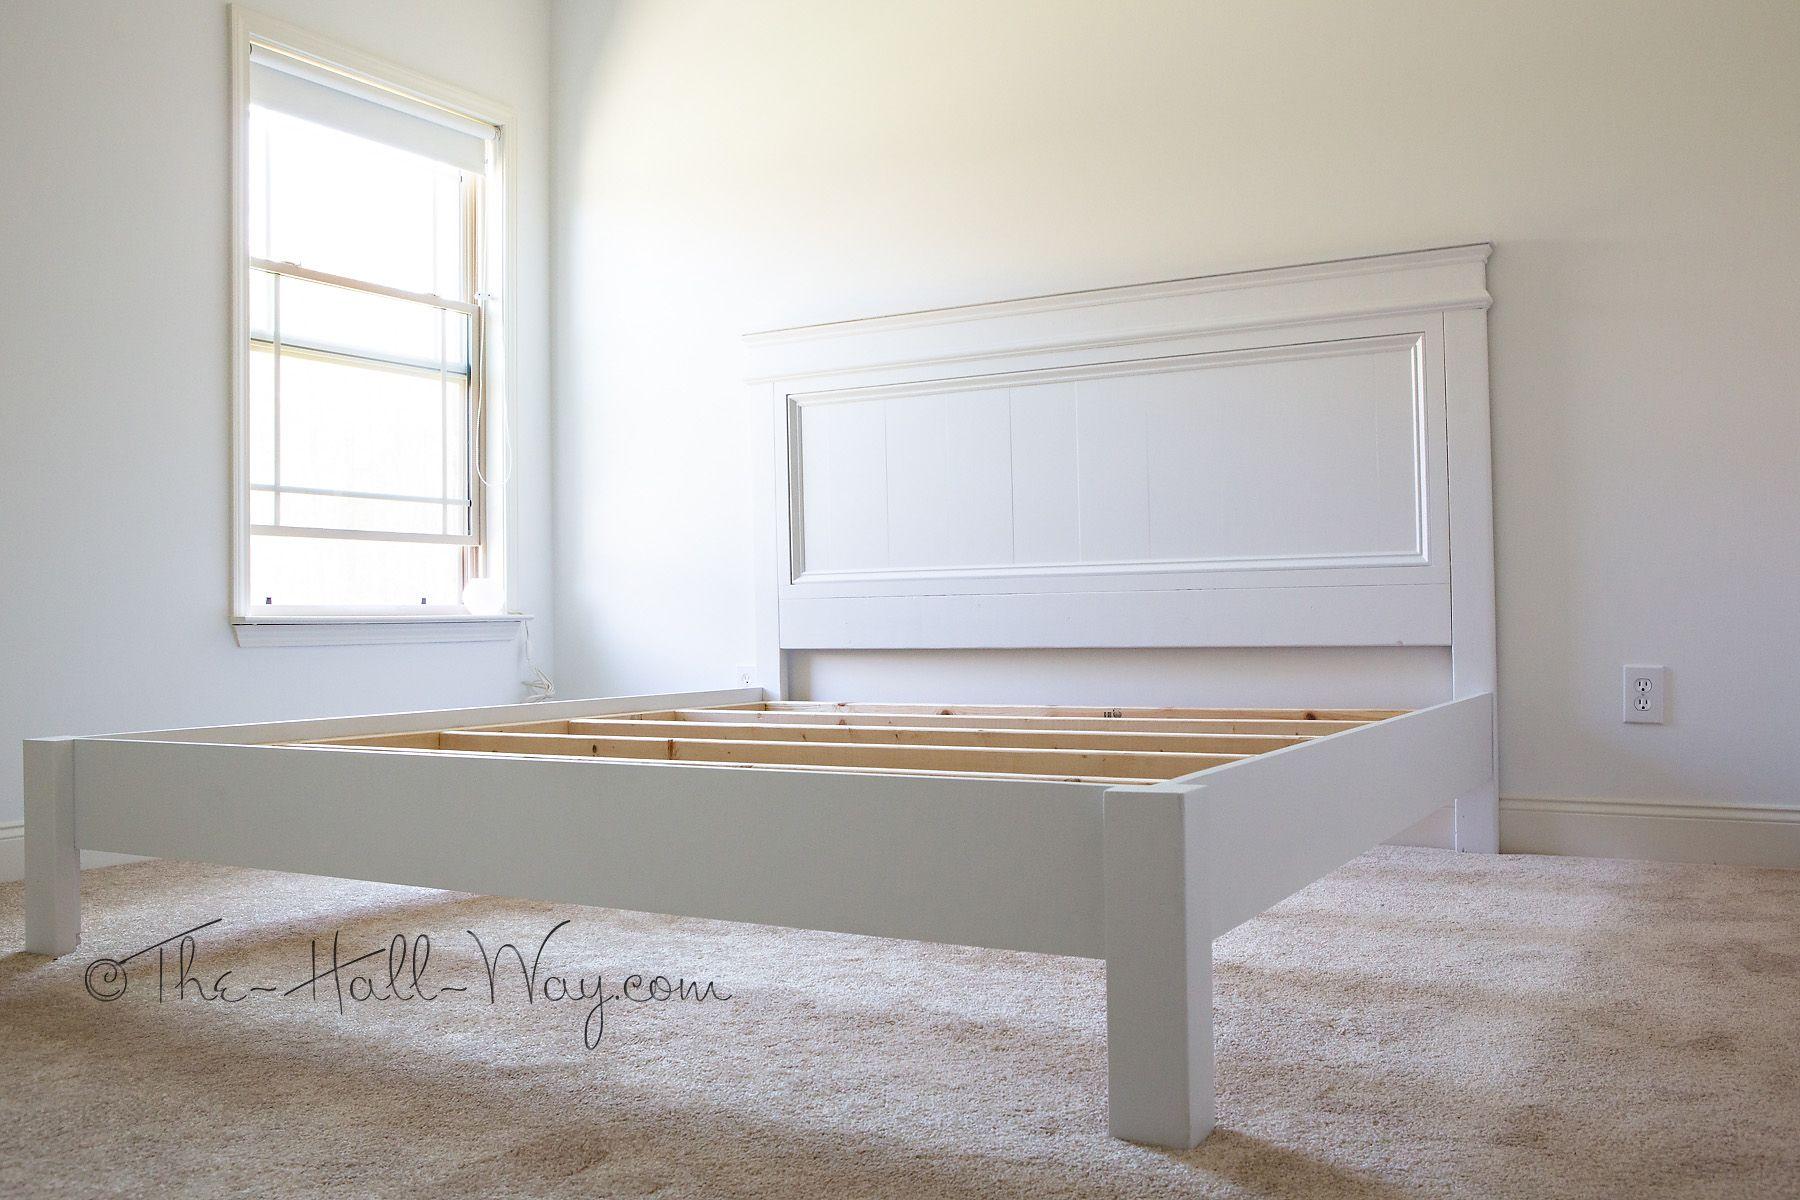 Bed High Off Ground Part - 45: Best 25+ King Size Platform Bed Ideas On Pinterest | Queen Platform Bed,  Diy Bed Frame And King Size Bed Frame